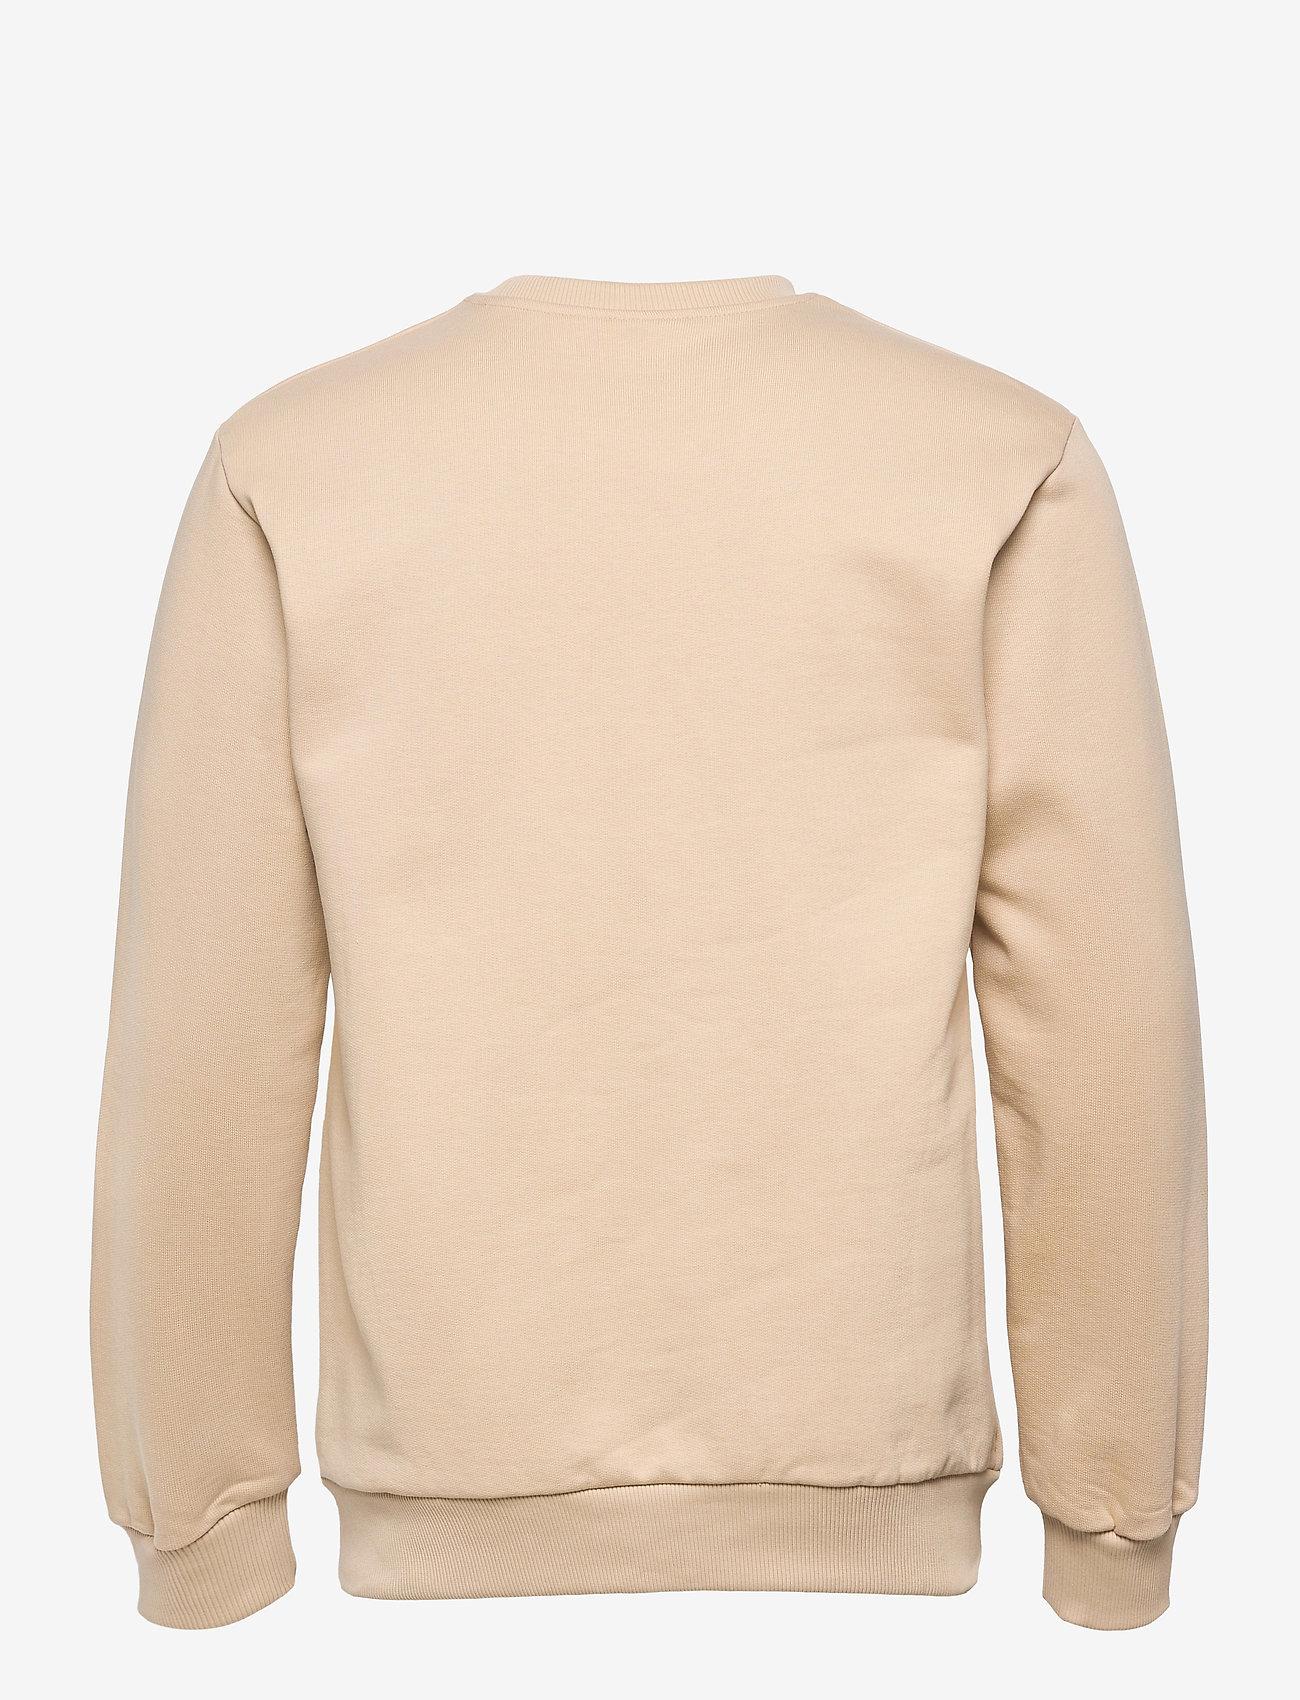 HAN Kjøbenhavn - Casual Crew - basic sweatshirts - sand - 1